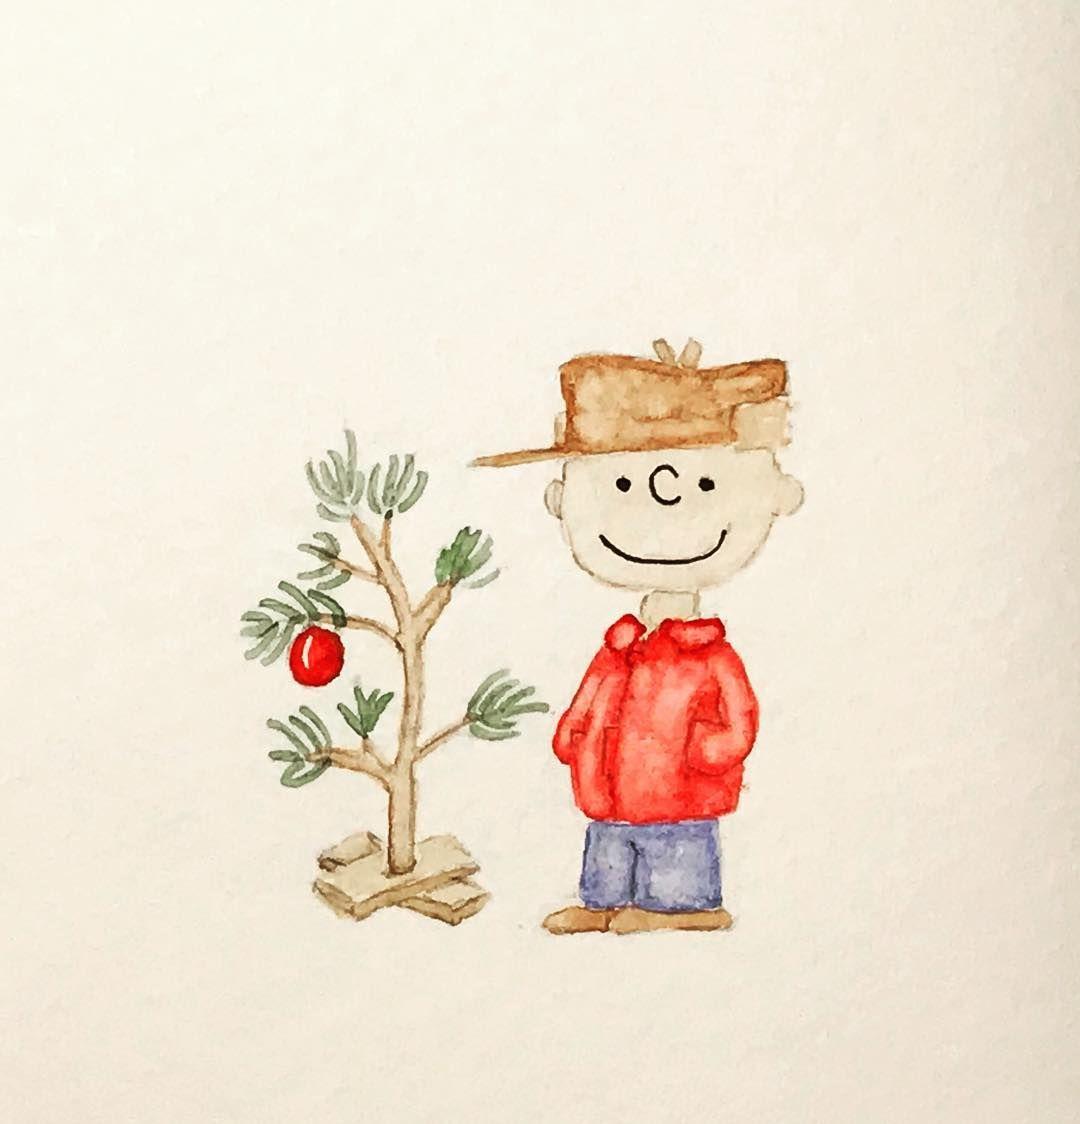 Charlie Brown Christmas Tree Drawing.Charliebrowntree Illustration Rights Belong To Peanuts